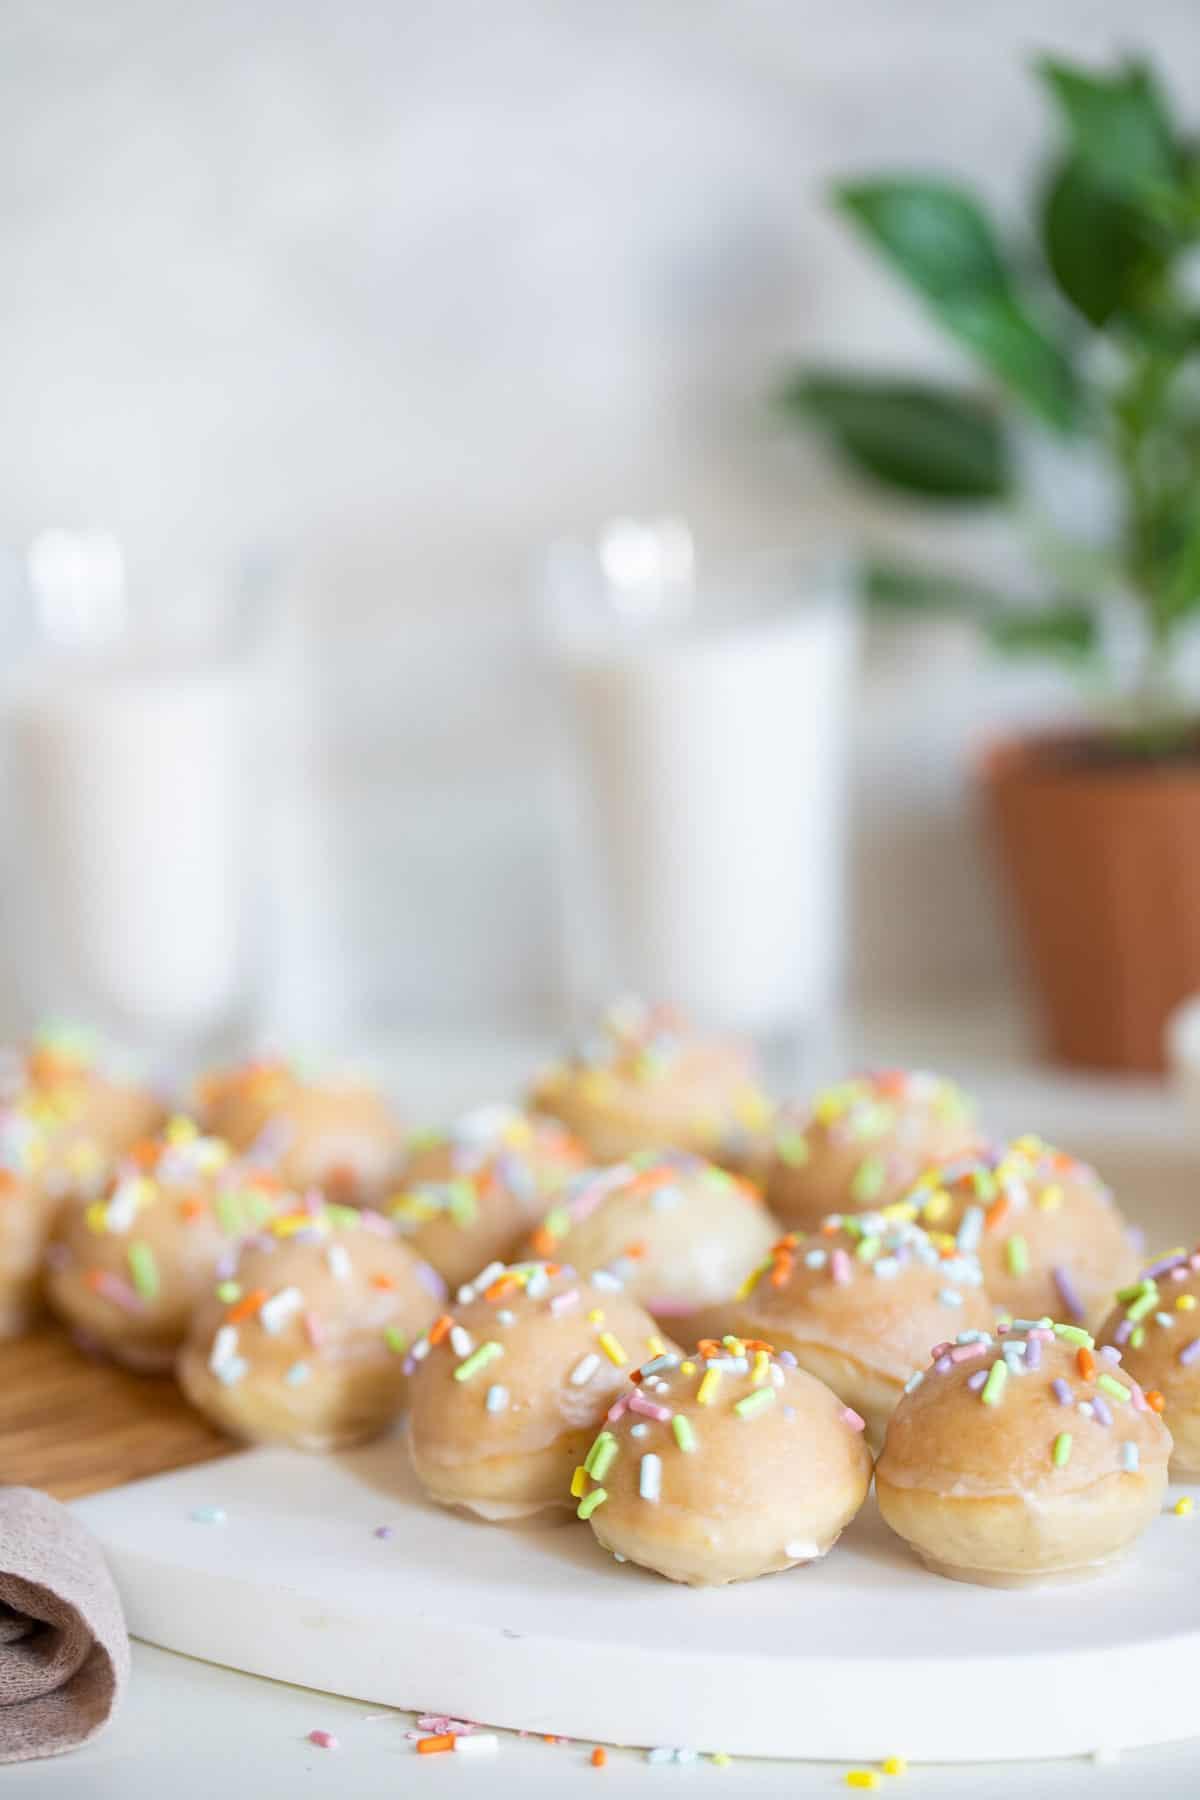 Vegan Sprinkle Donut Holes